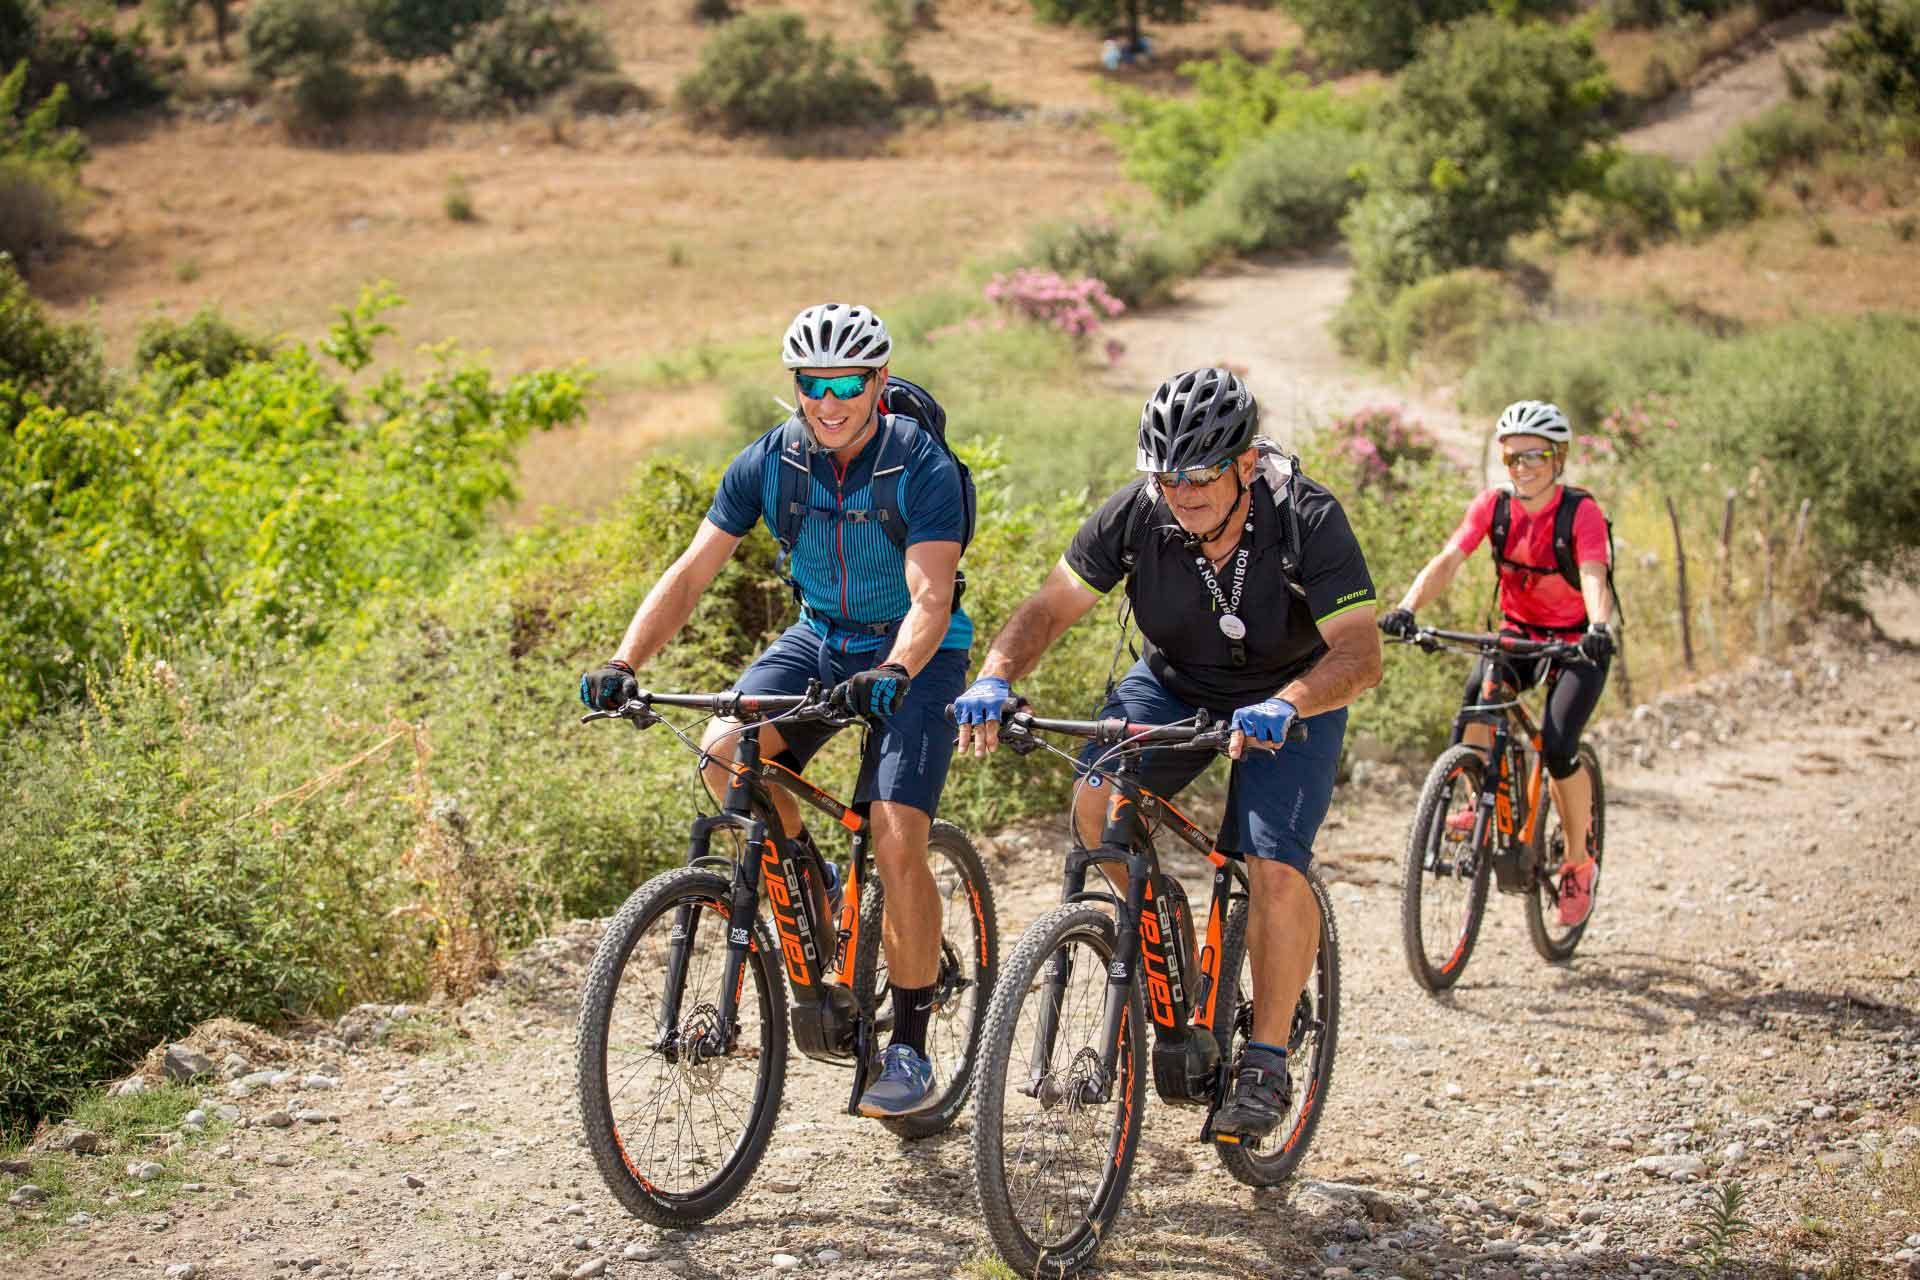 ROBINSON CLUB SARIGERME PARK - Biken